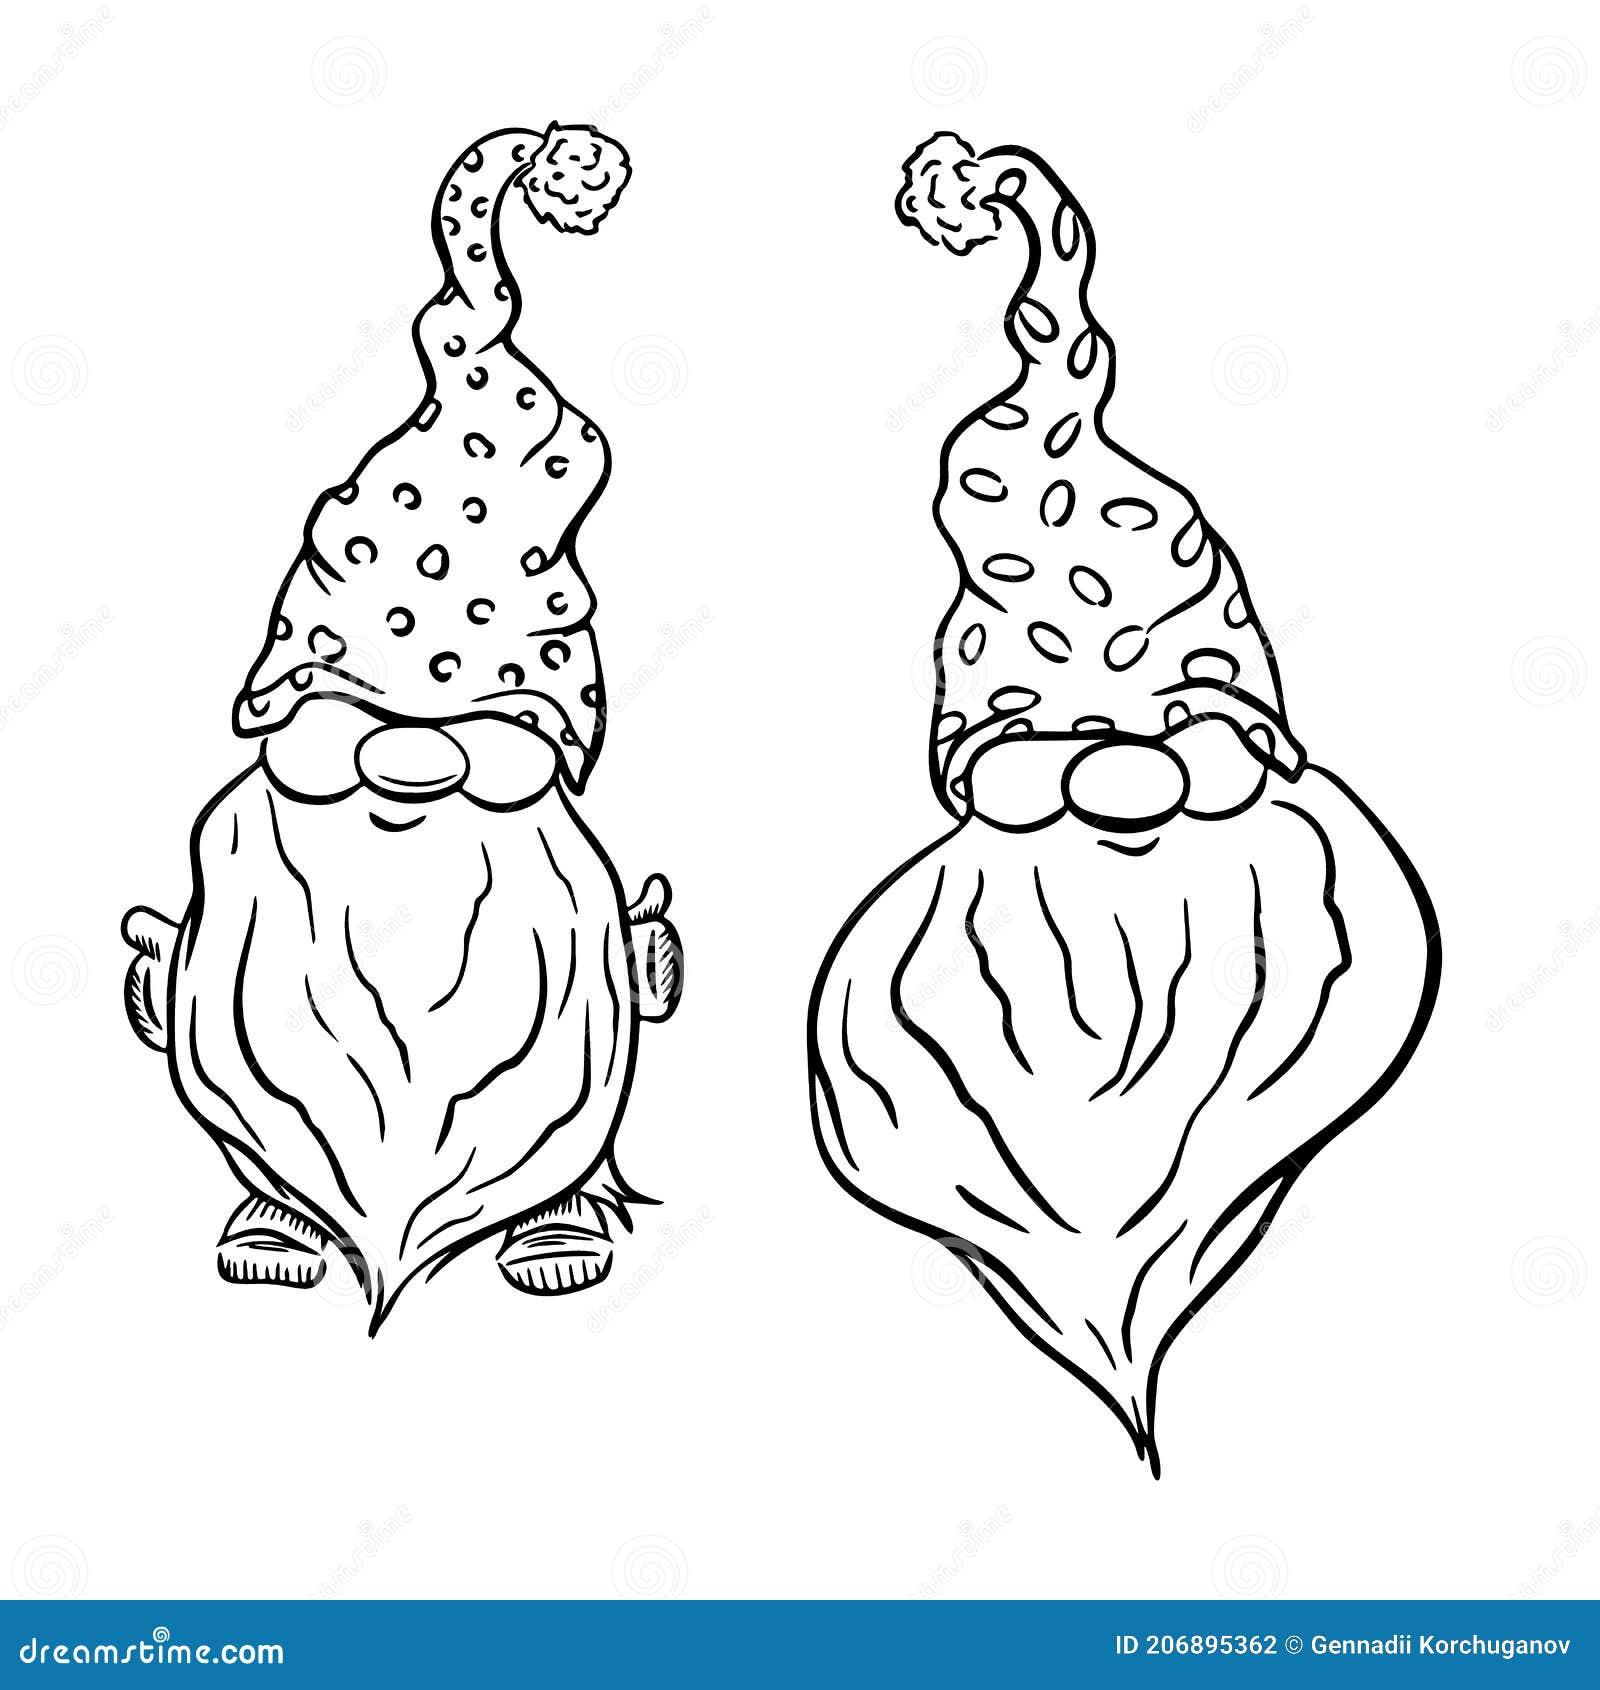 Black White Gnomes Stock Illustrations 174 Black White Gnomes Stock Illustrations Vectors Clipart Dreamstime